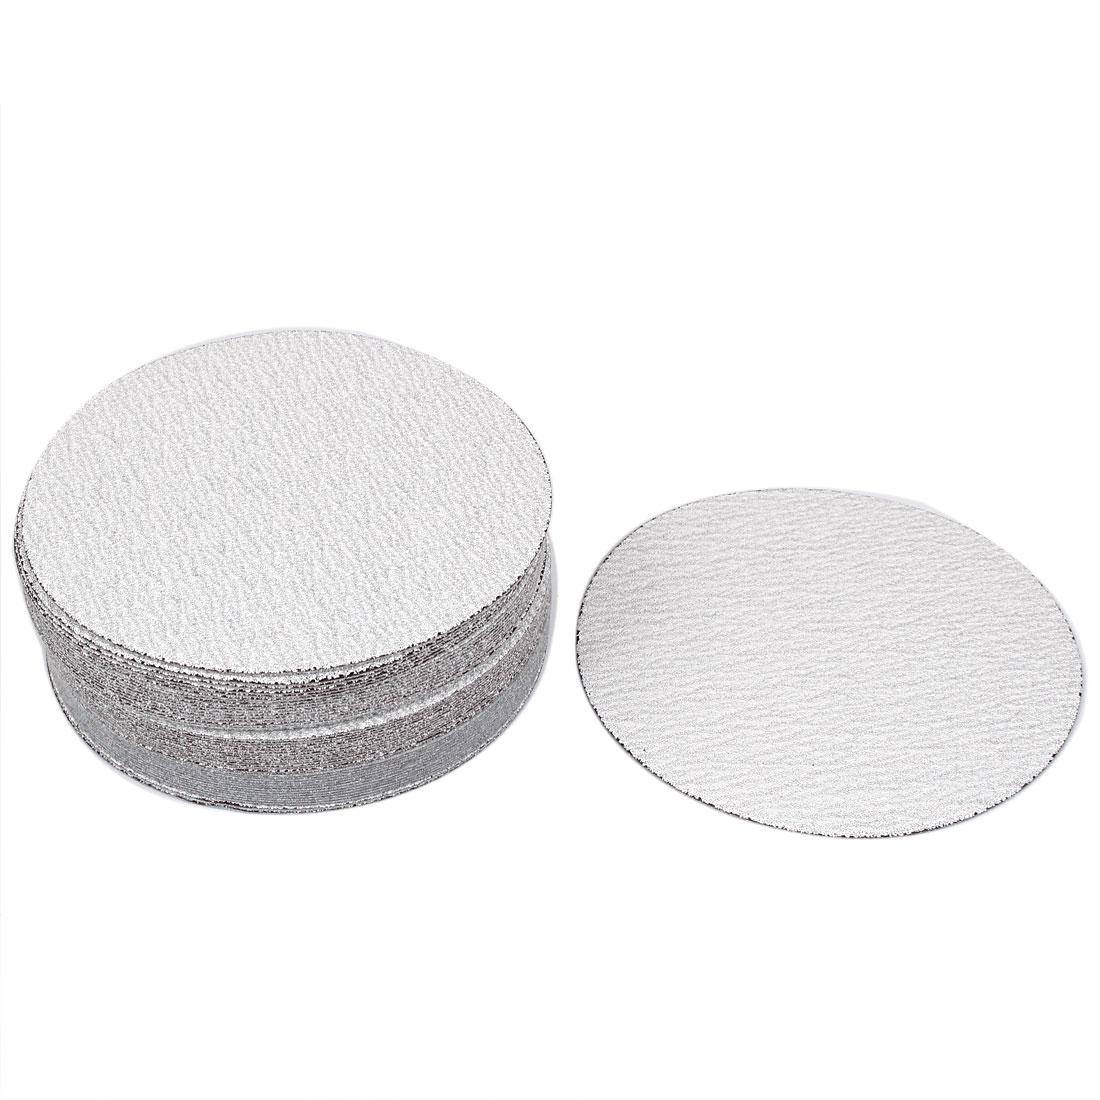 "6"" Dia Polishing Round Dry Abrasive Sanding Sandpaper Sheet Disc 120 Grit 50pcs"